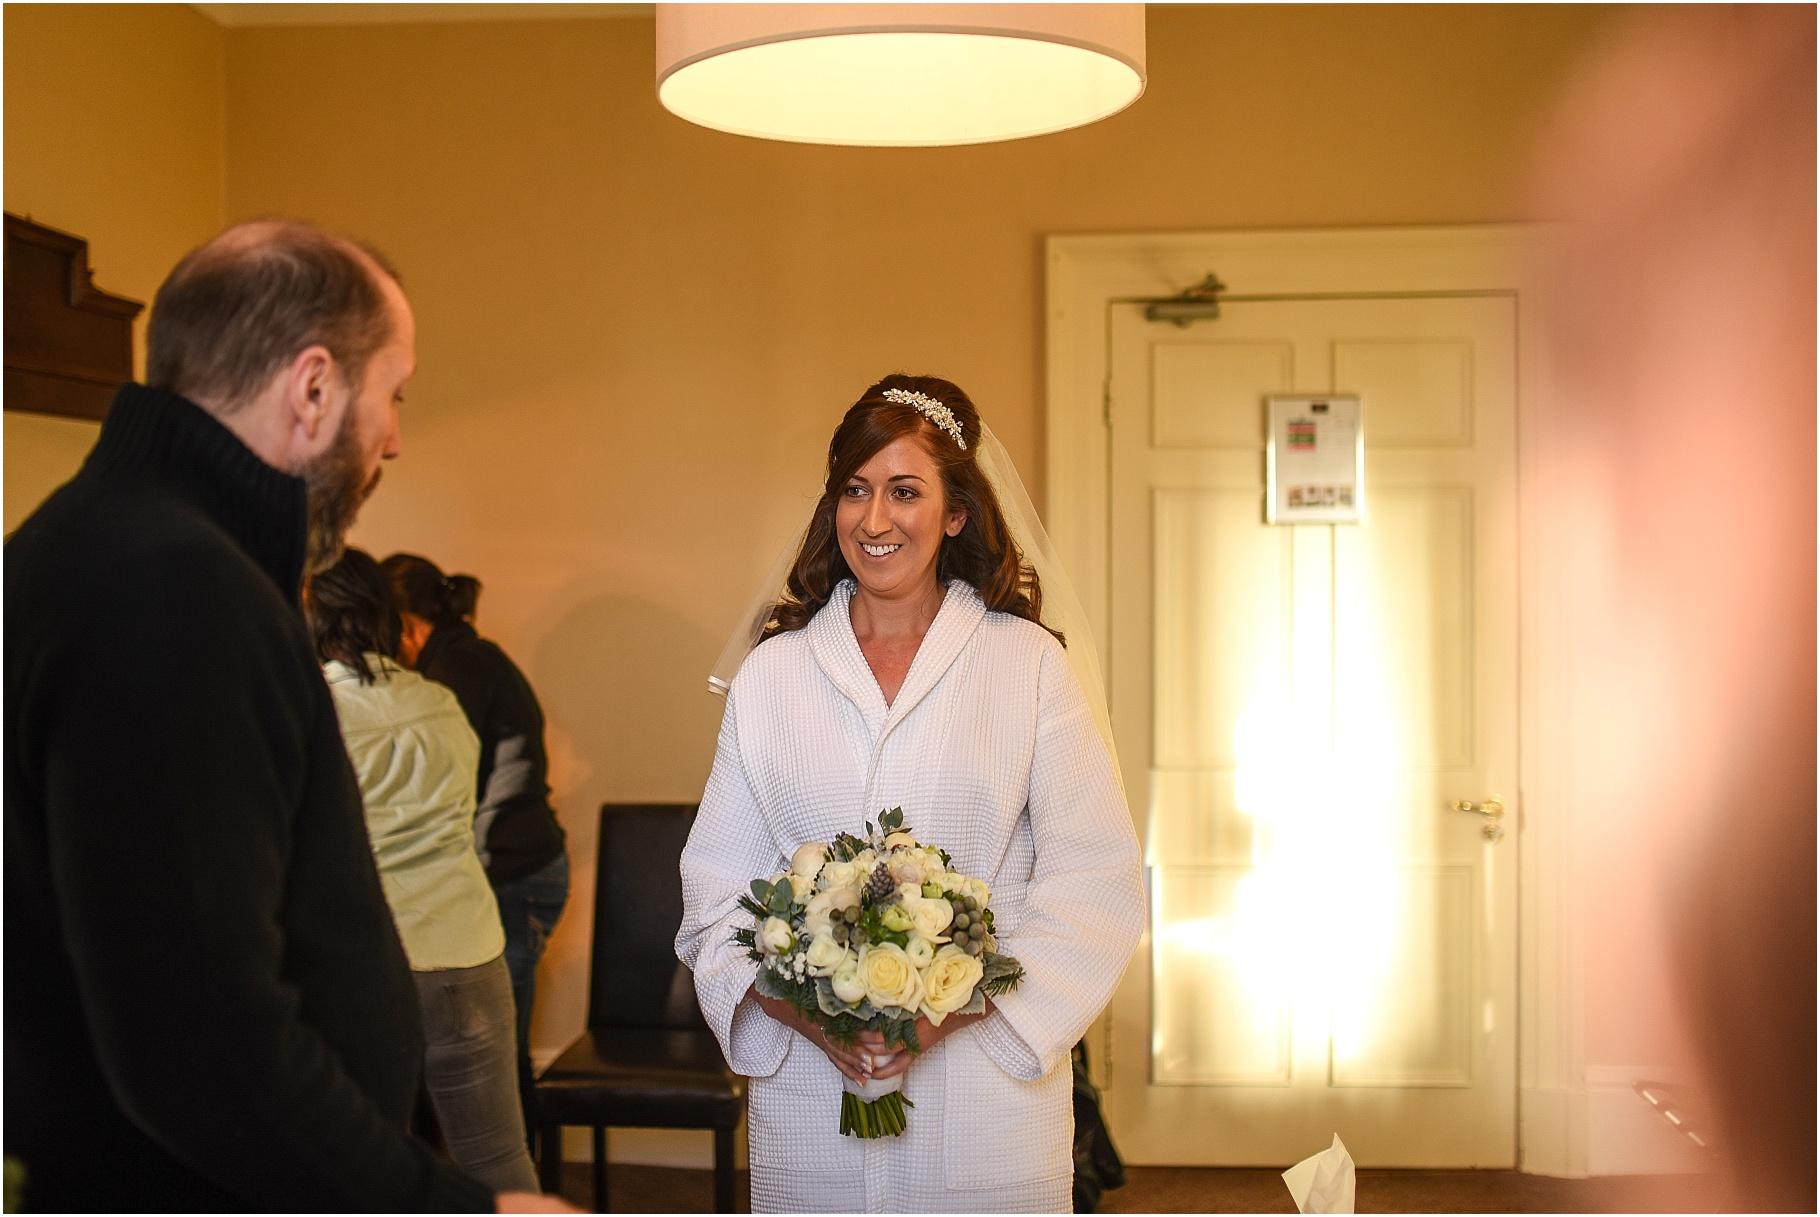 bartle-hall-wedding-13.jpg